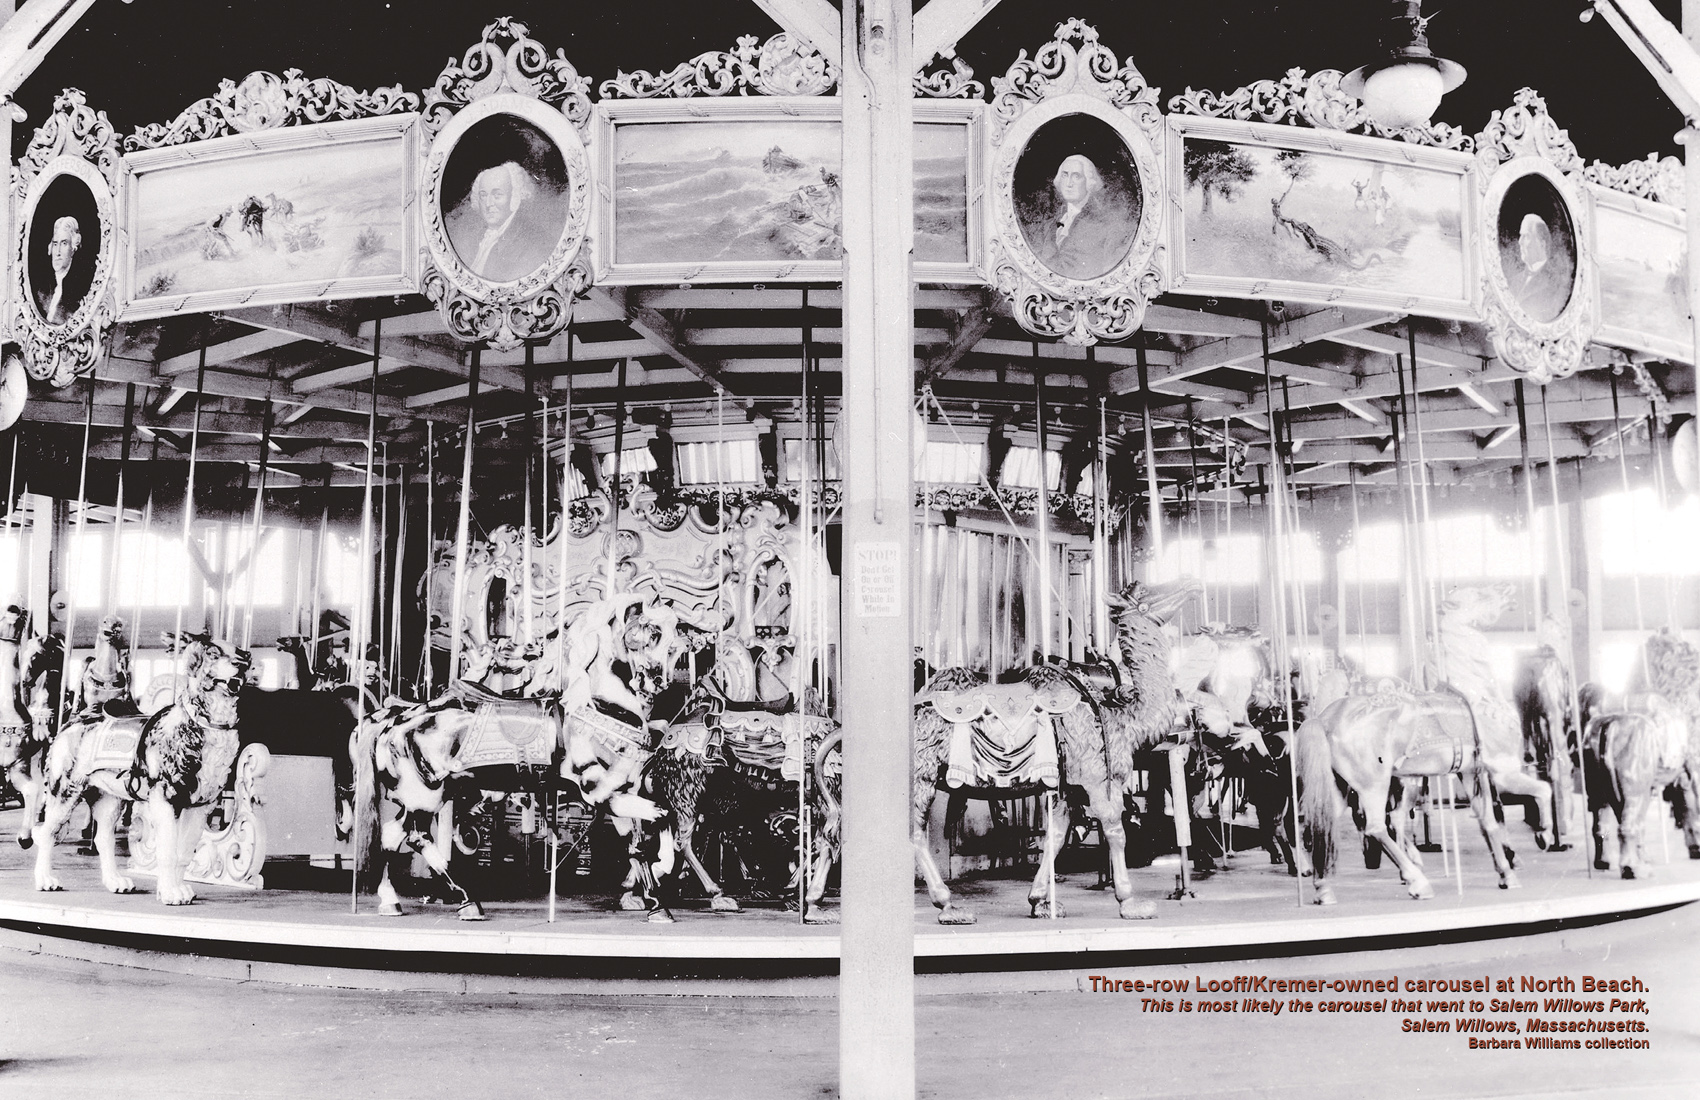 Looff-Kremer-carousel-Salem-Willows-Park-CNT-center-Jan-13